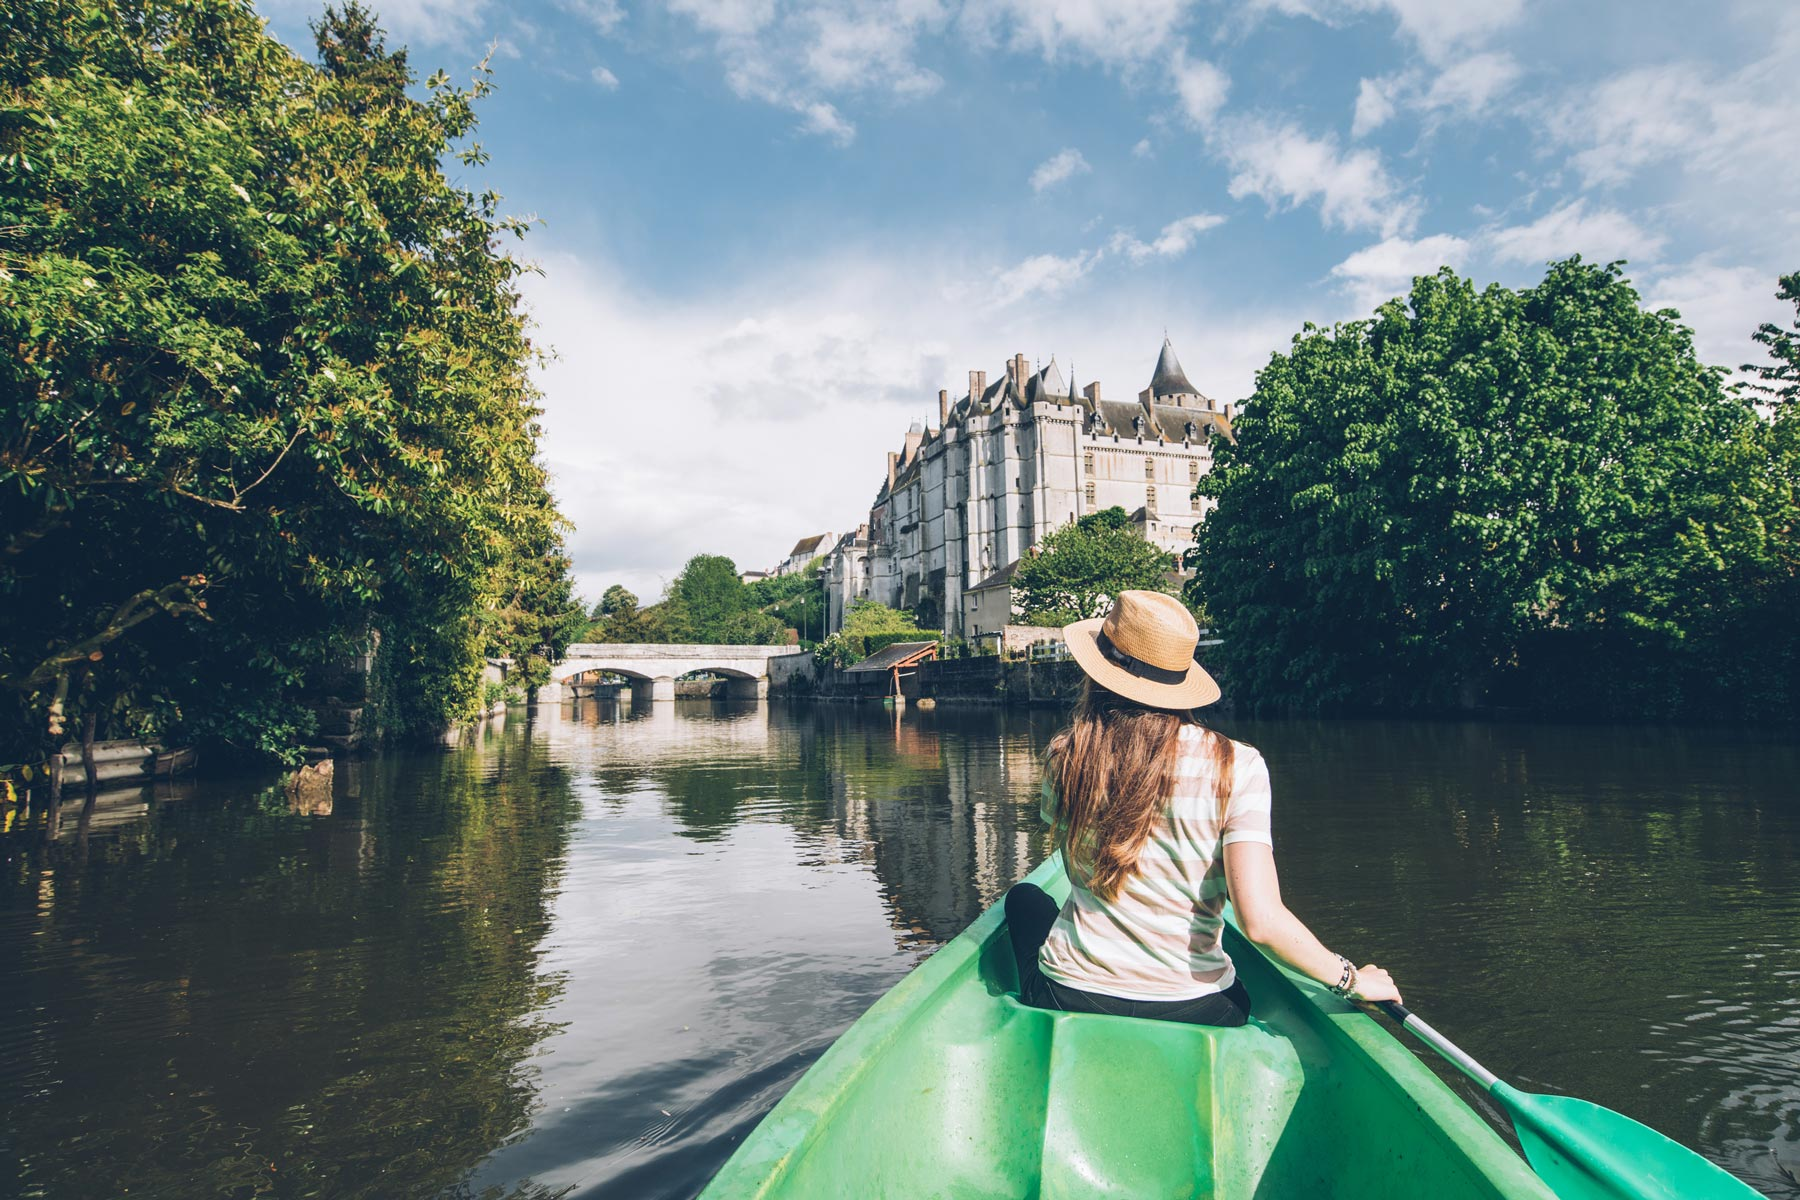 Chateaudun, location canoe